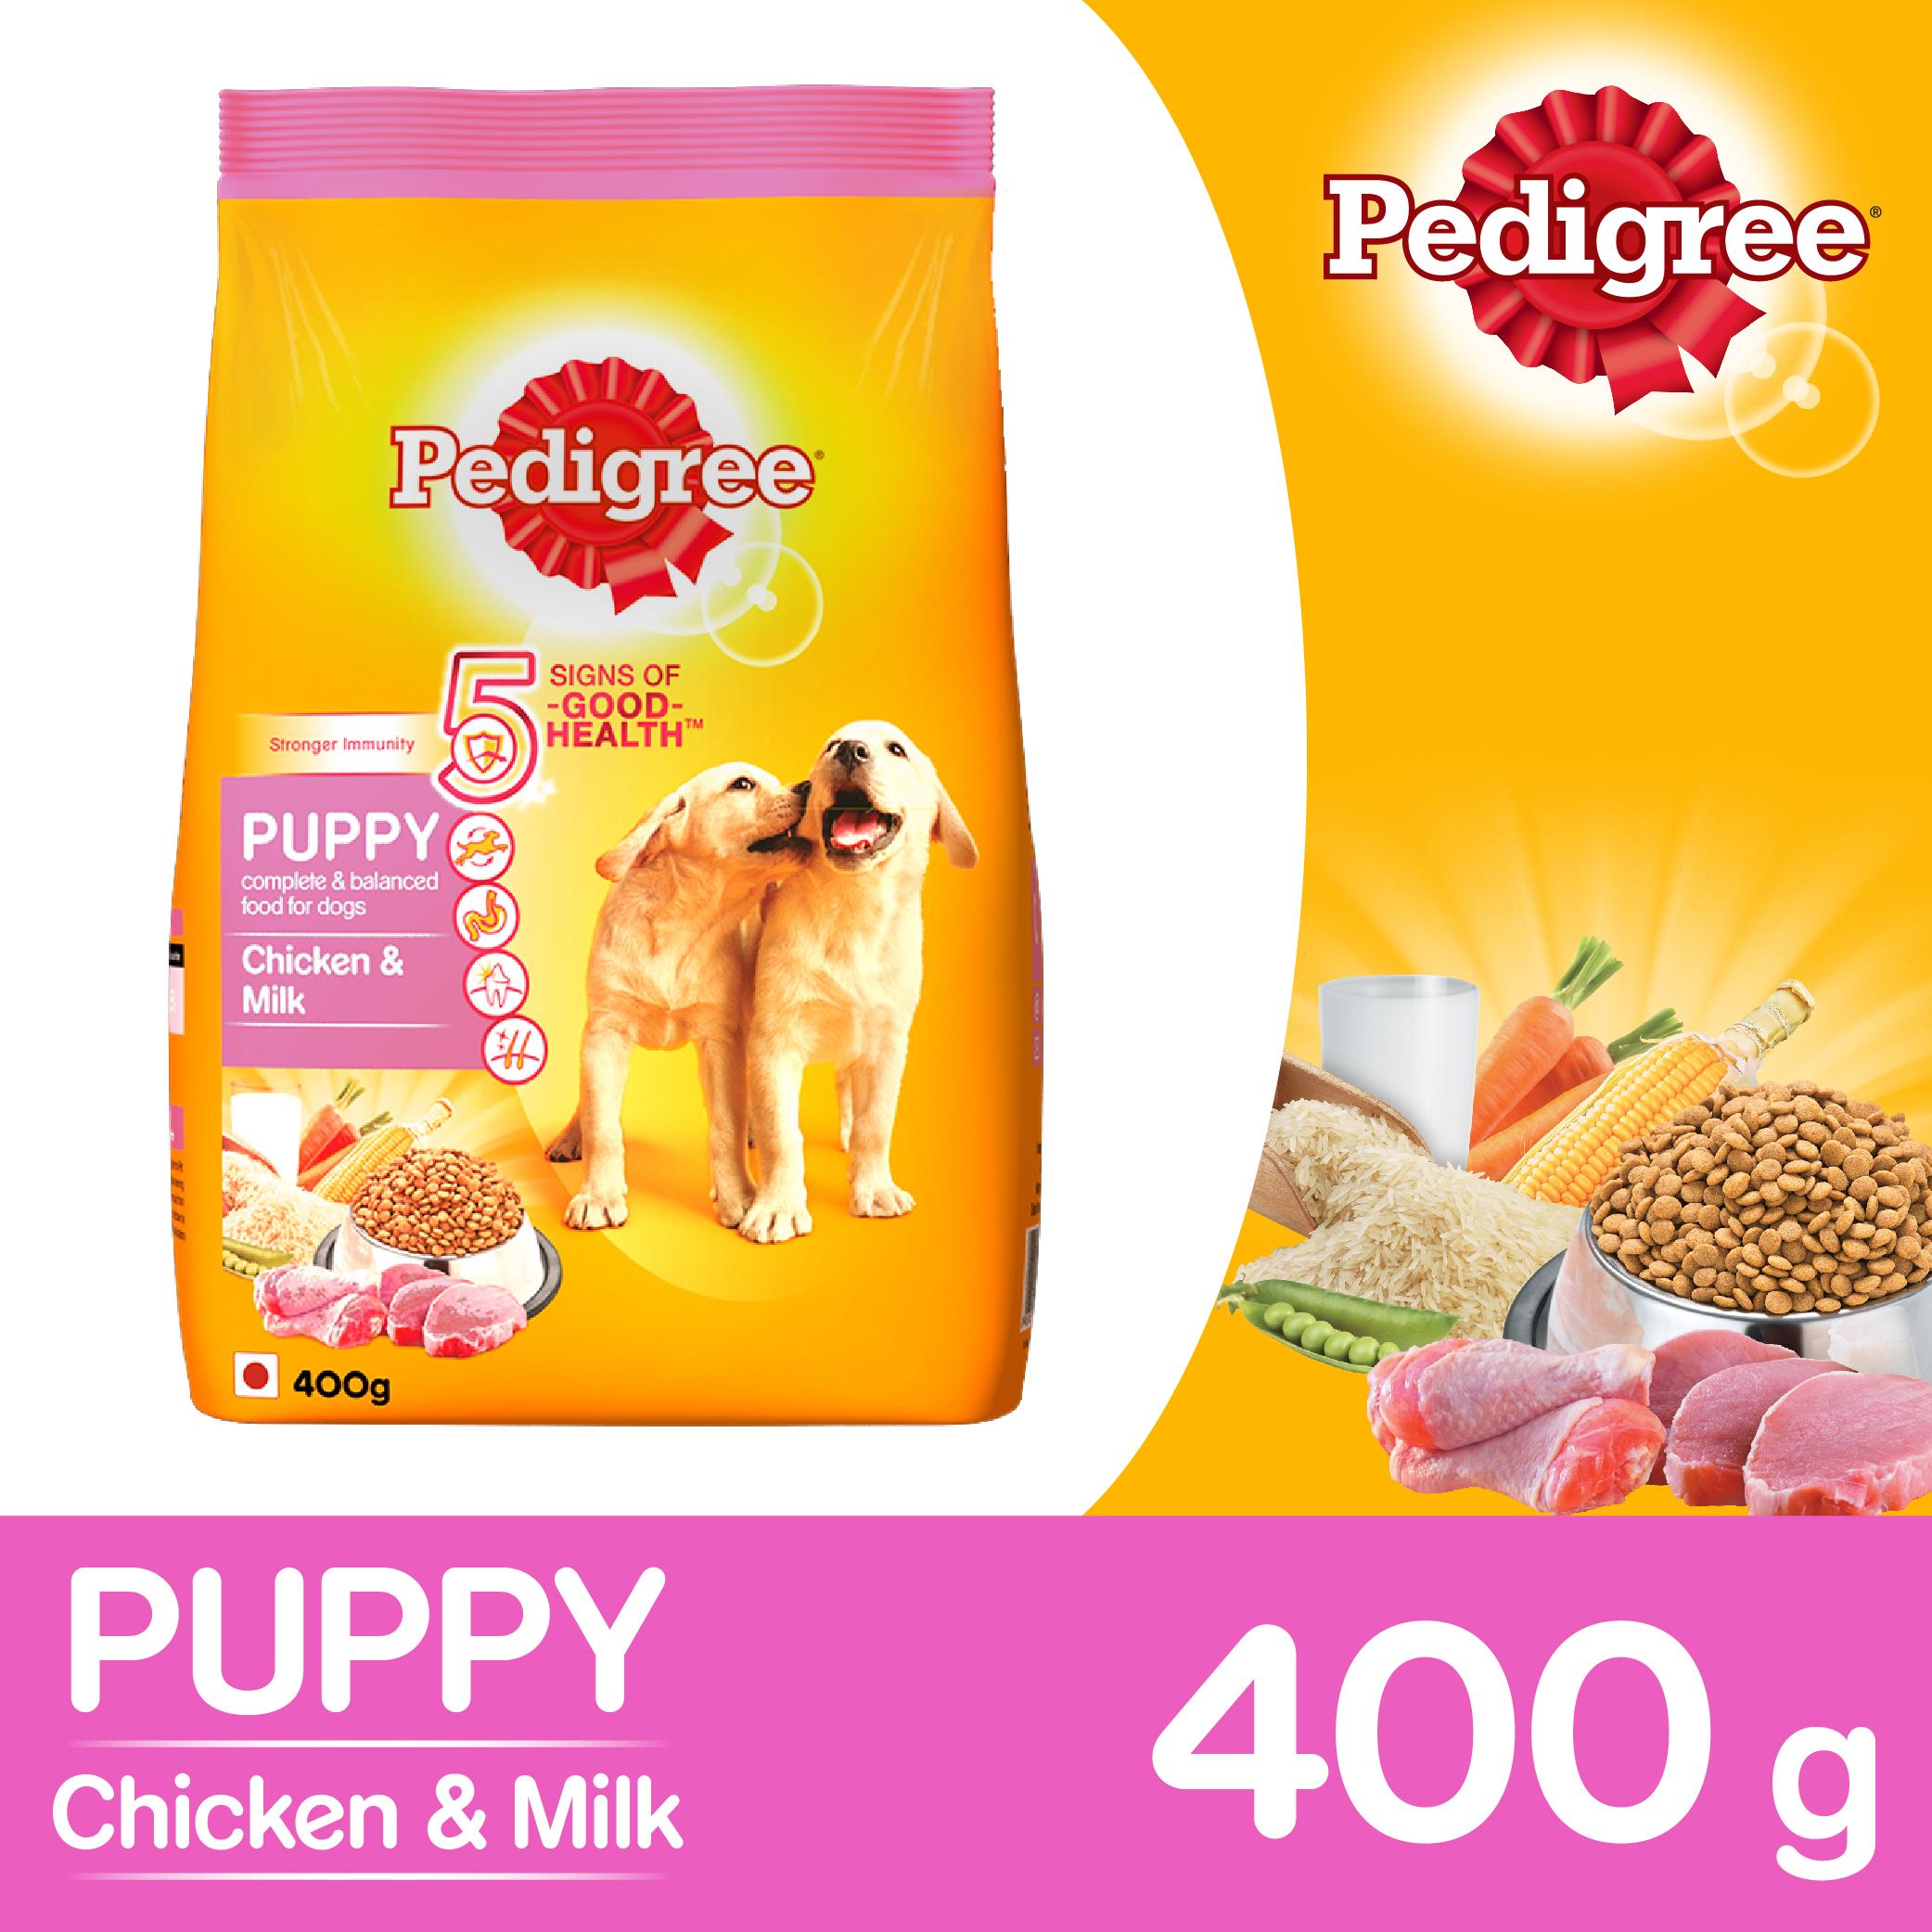 Pedigree Soft Dog Food Coupons